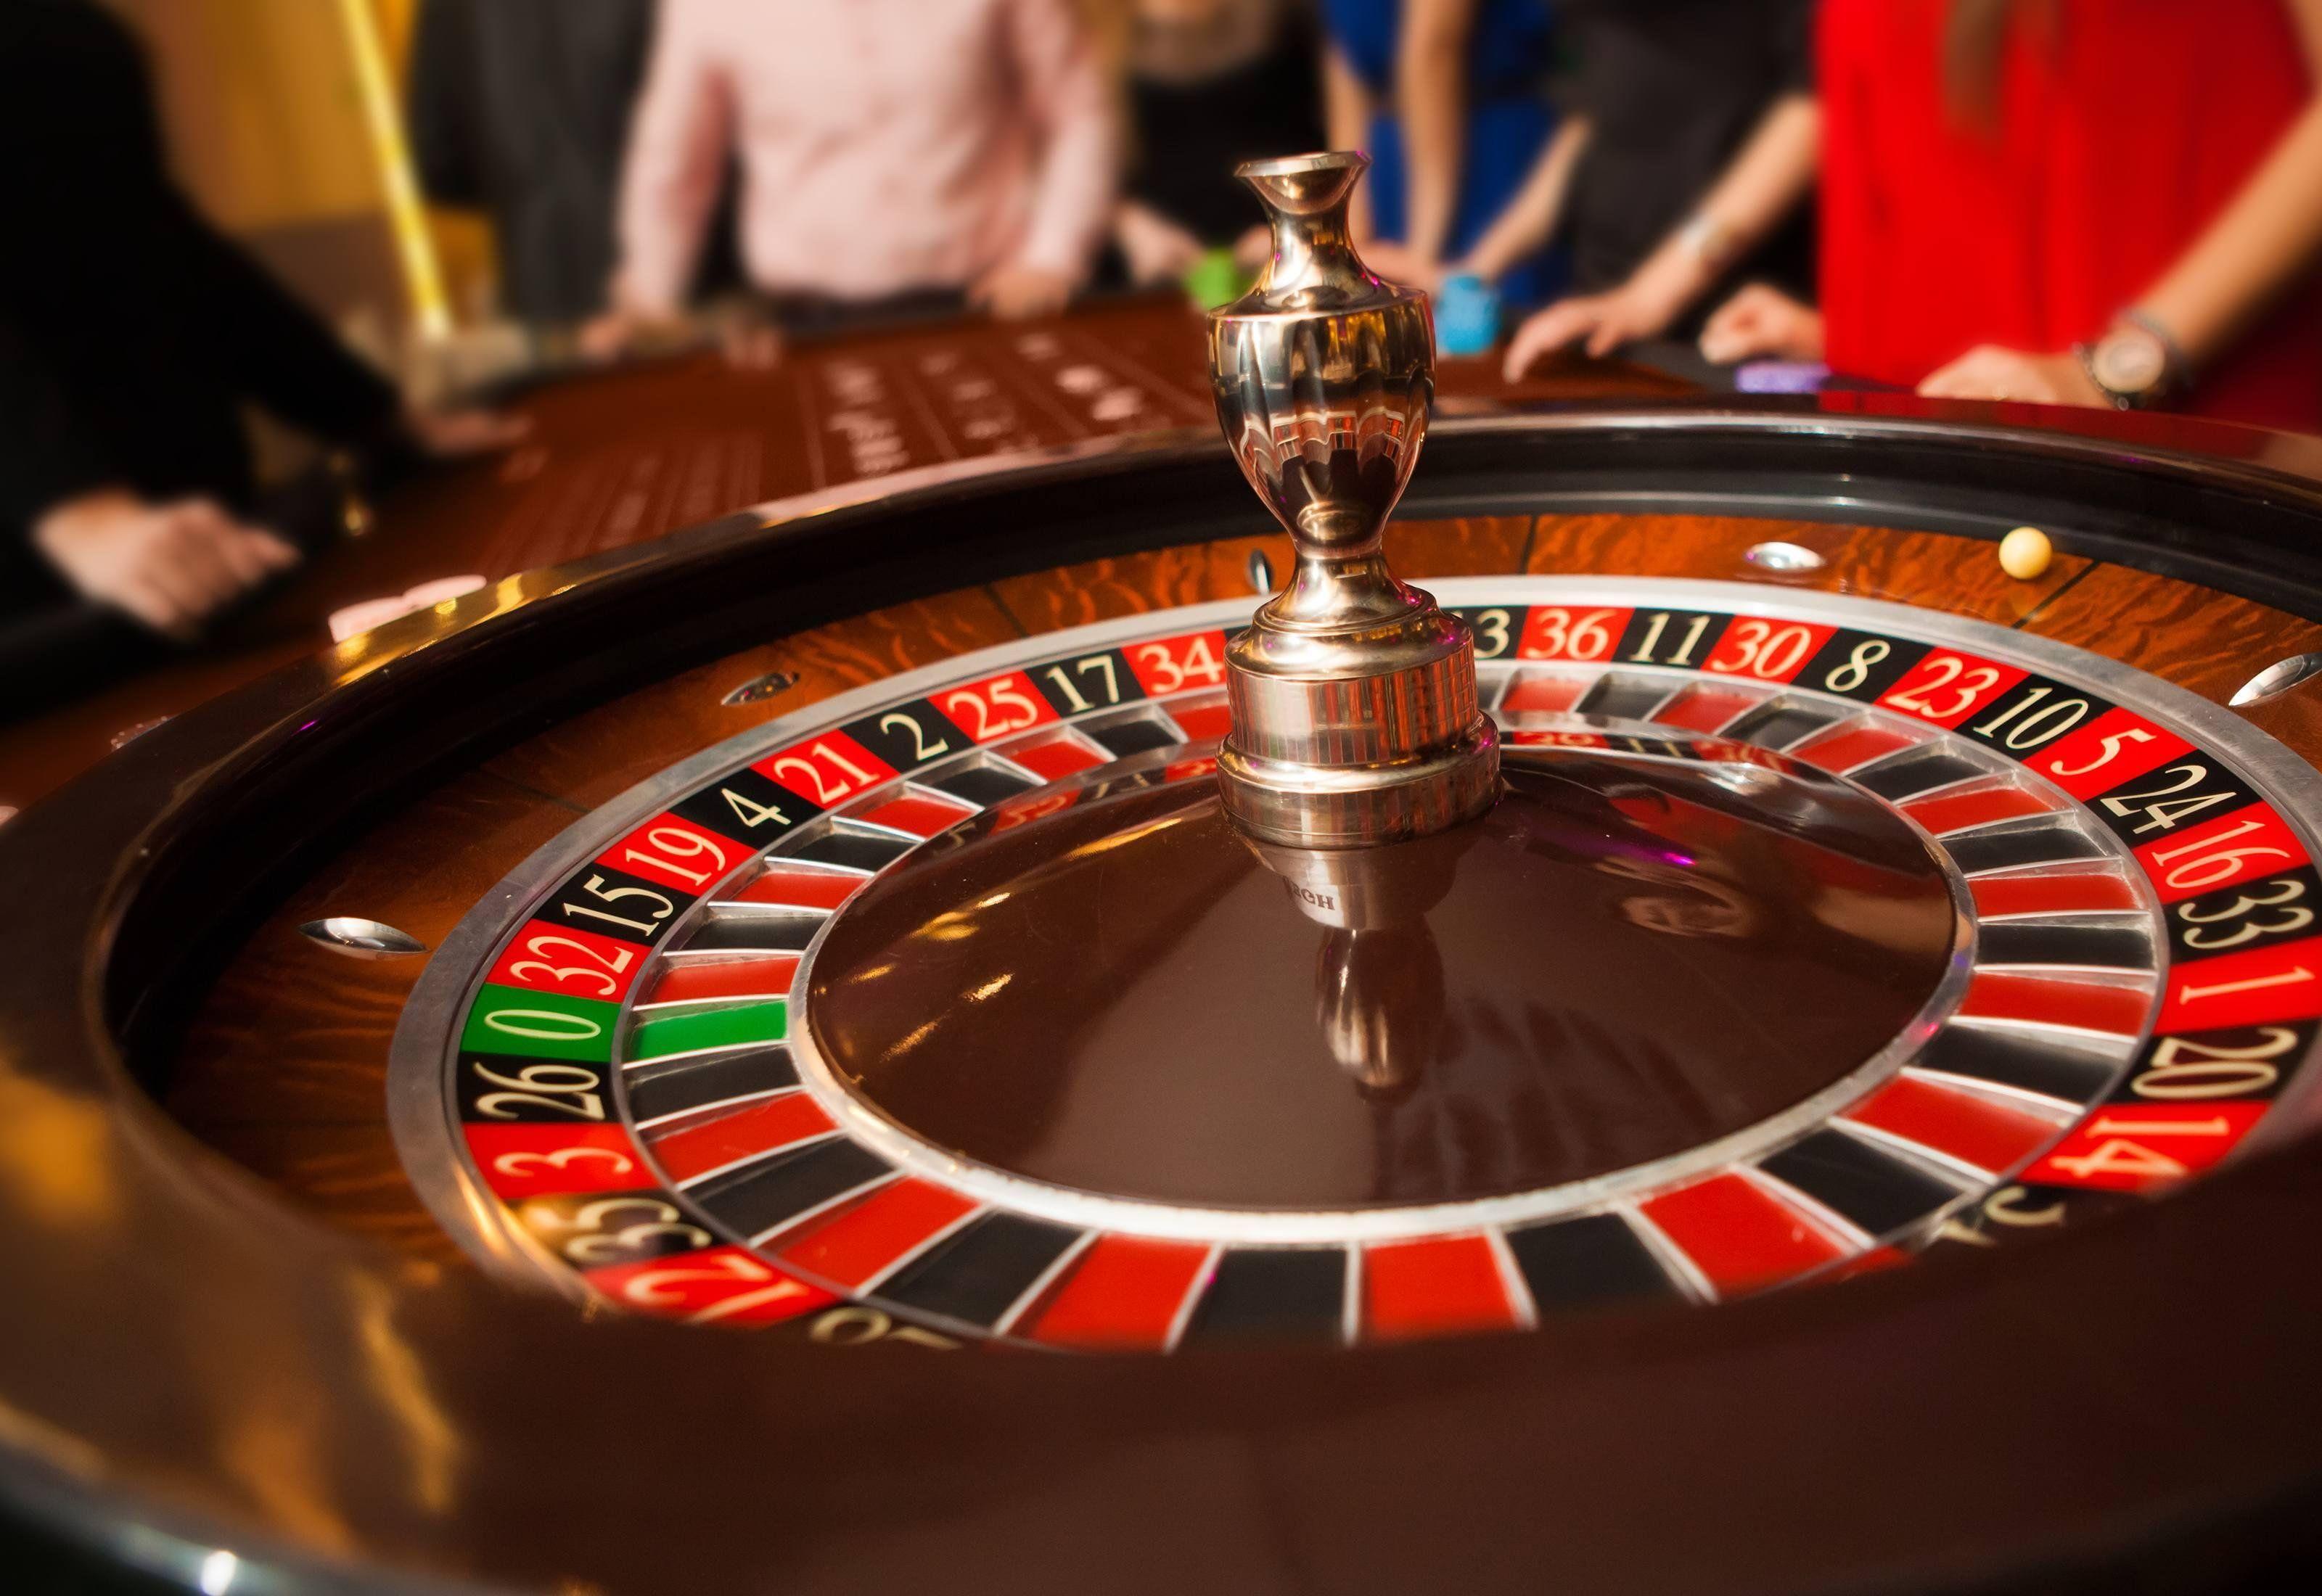 /building-an-ethereum-based-decentralized-casino-how-i-did-it-az1p33bx feature image